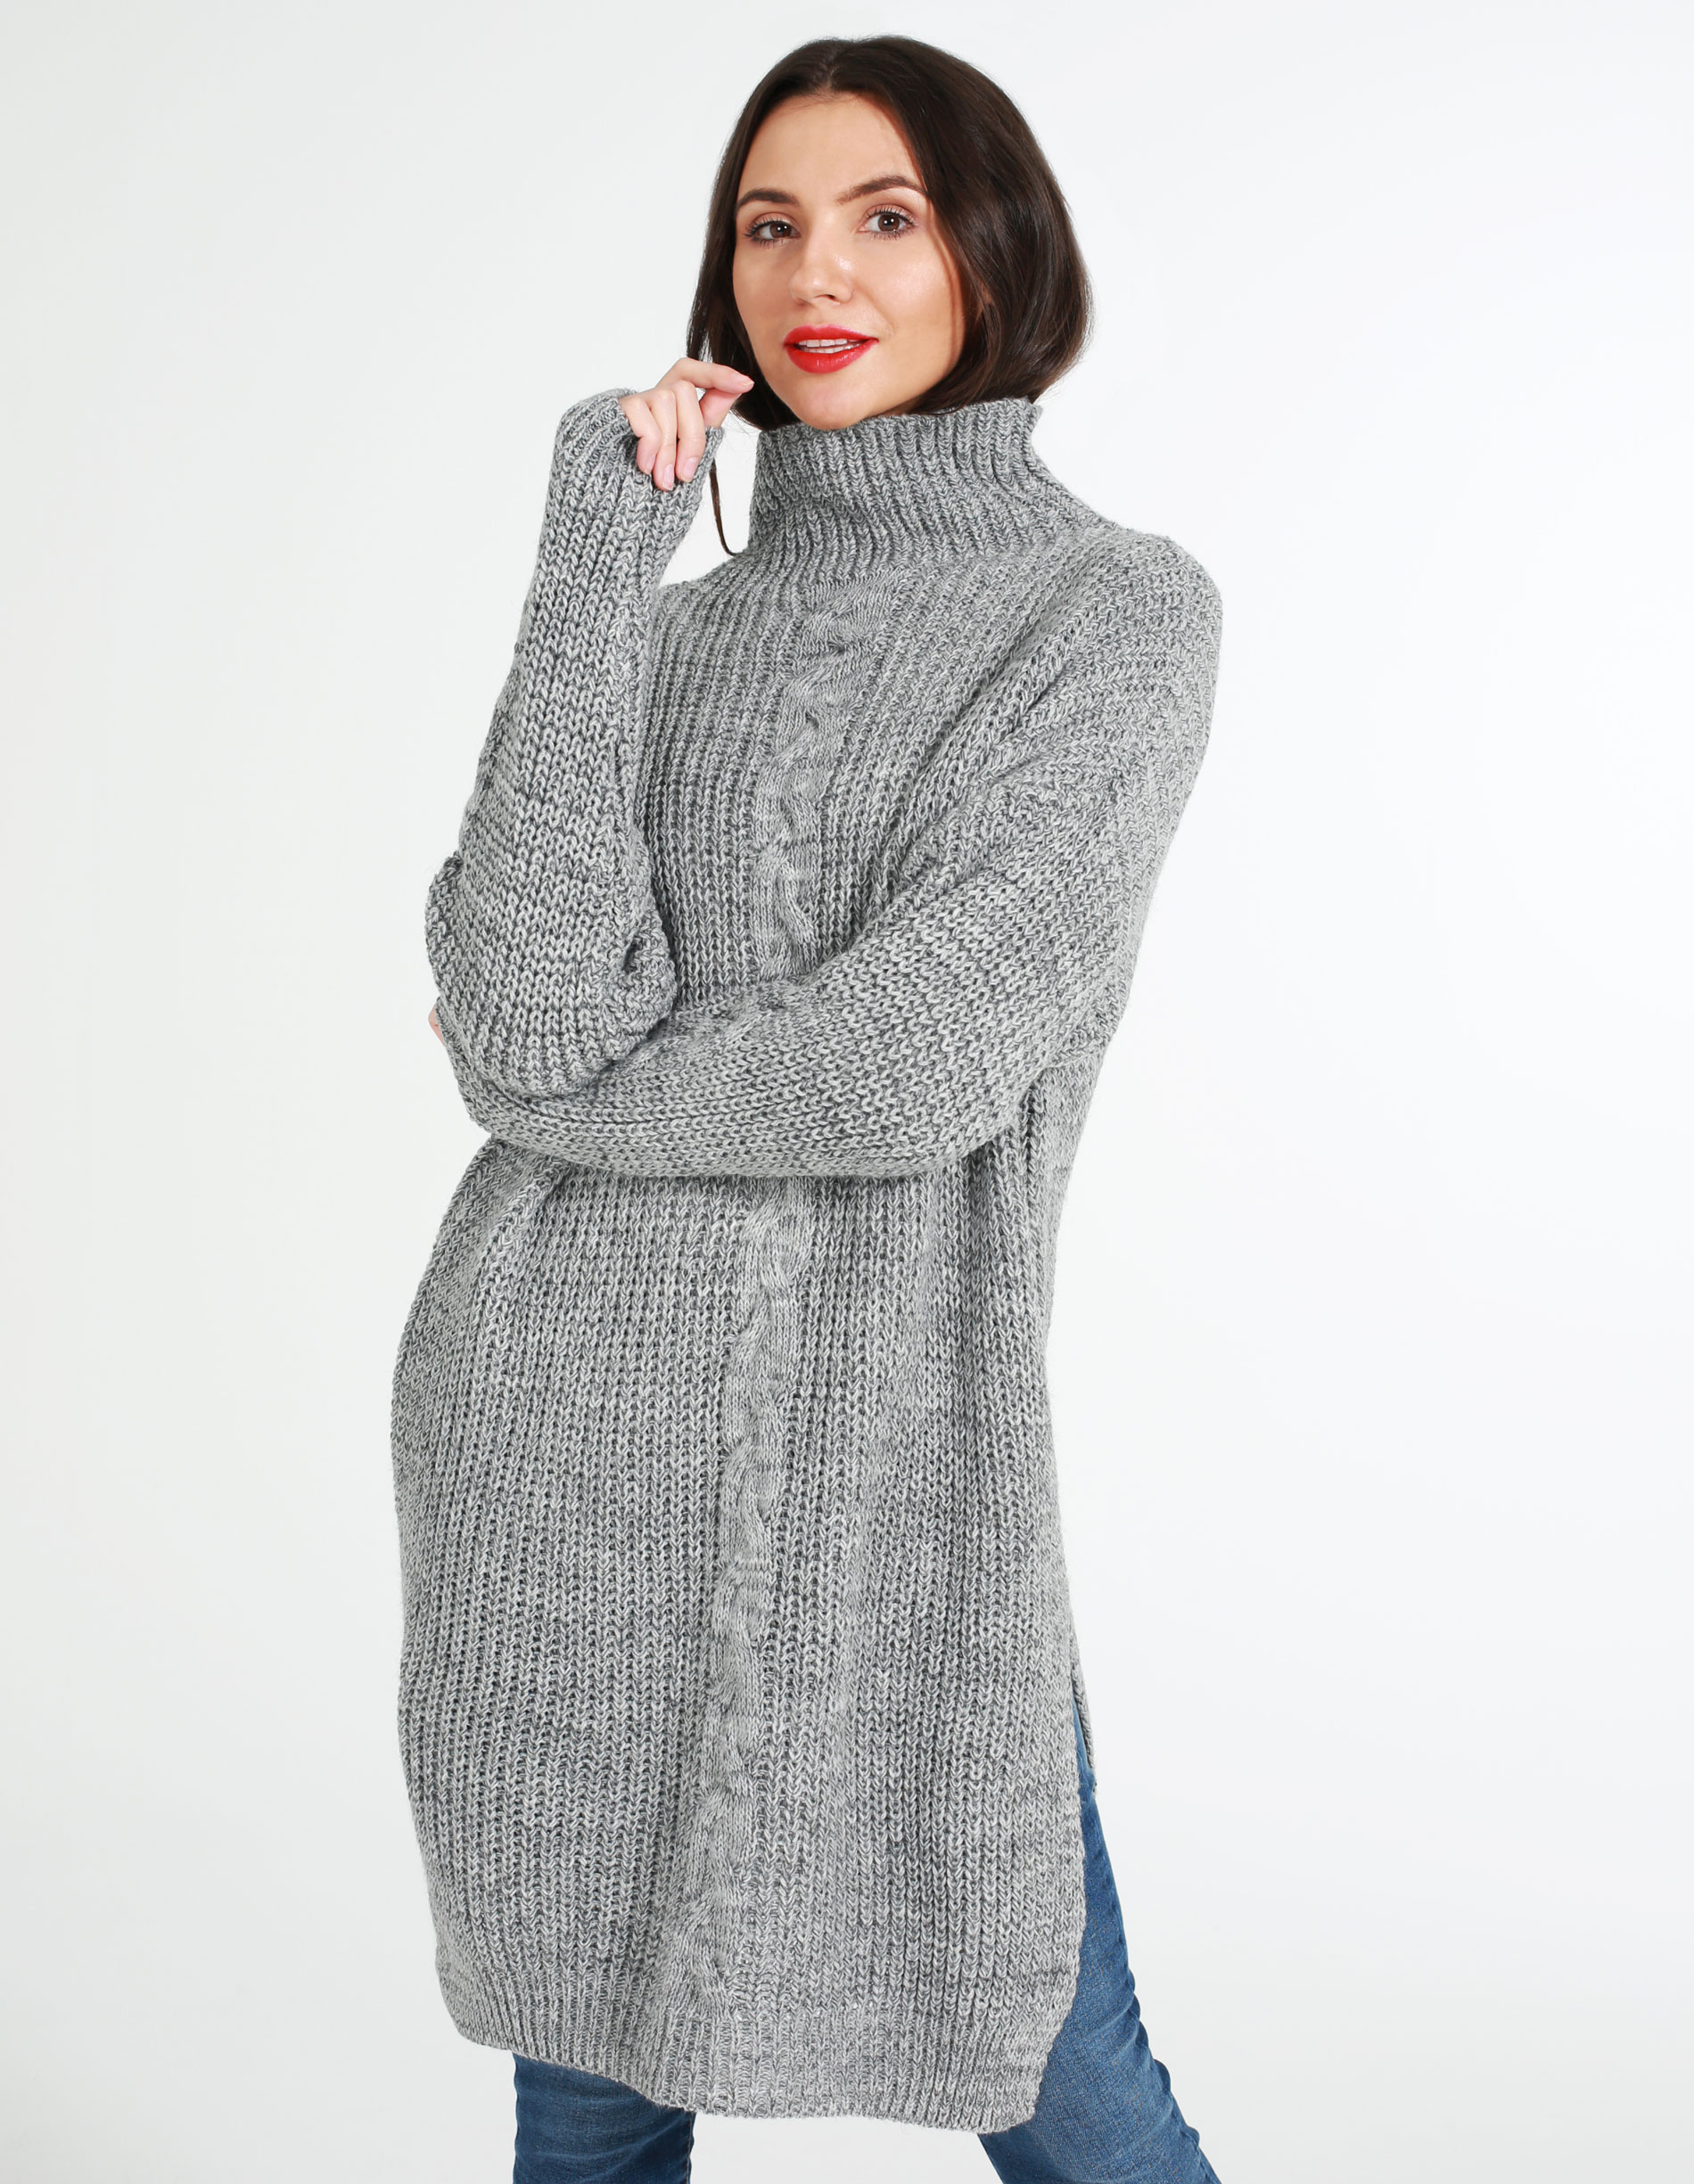 Sweter - 4-6111 GRI SC - Unisono